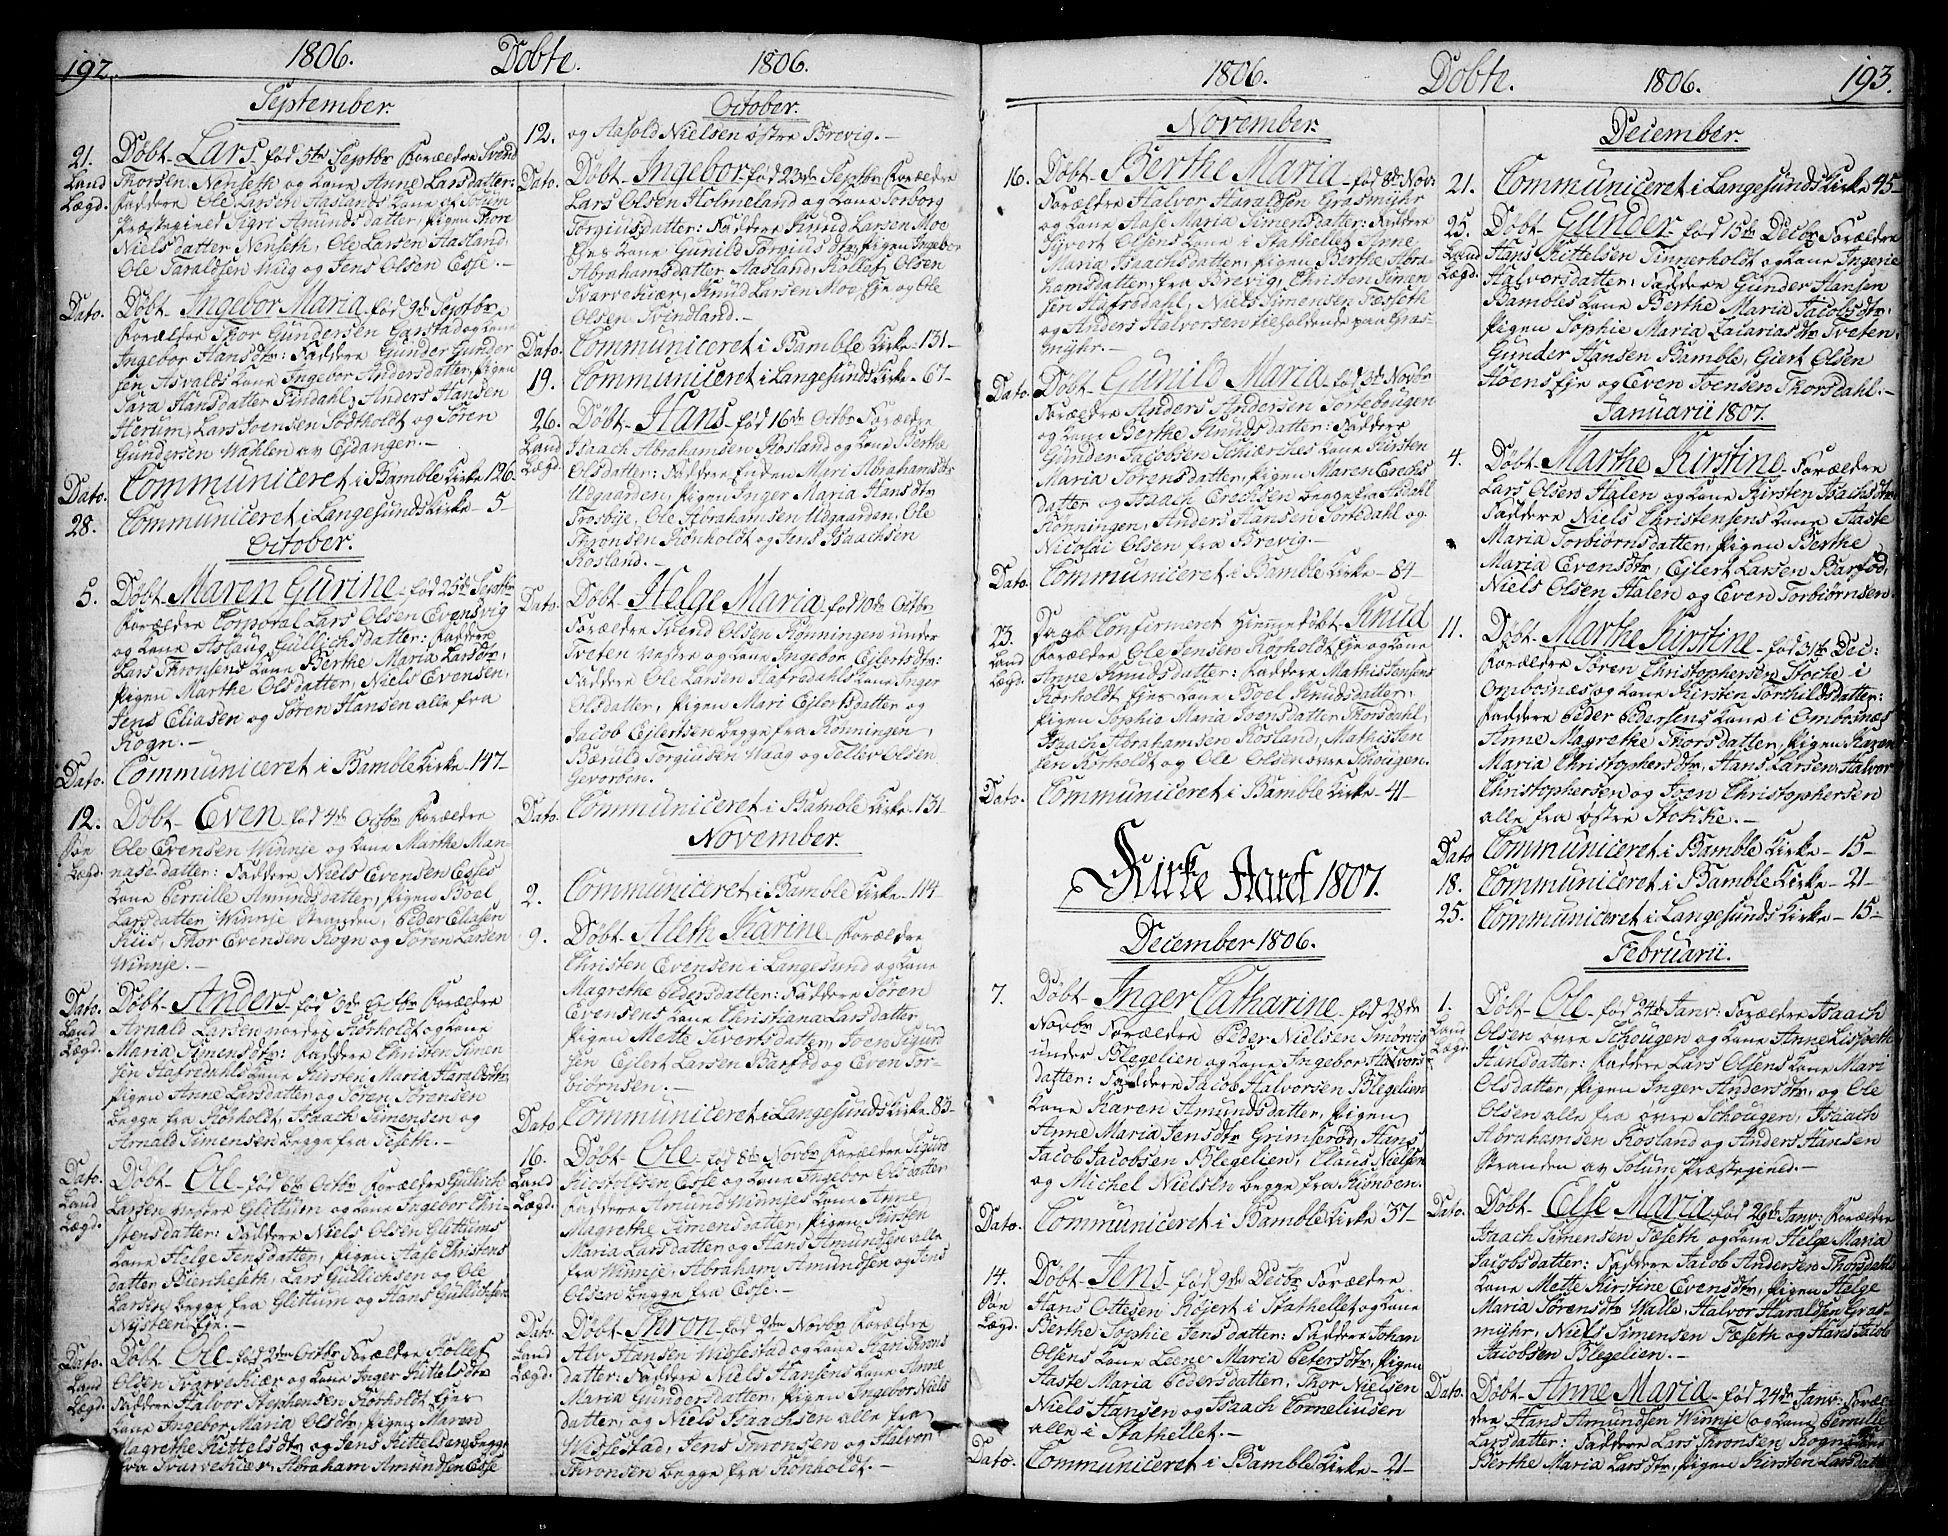 SAKO, Bamble kirkebøker, F/Fa/L0002: Ministerialbok nr. I 2, 1775-1814, s. 192-193